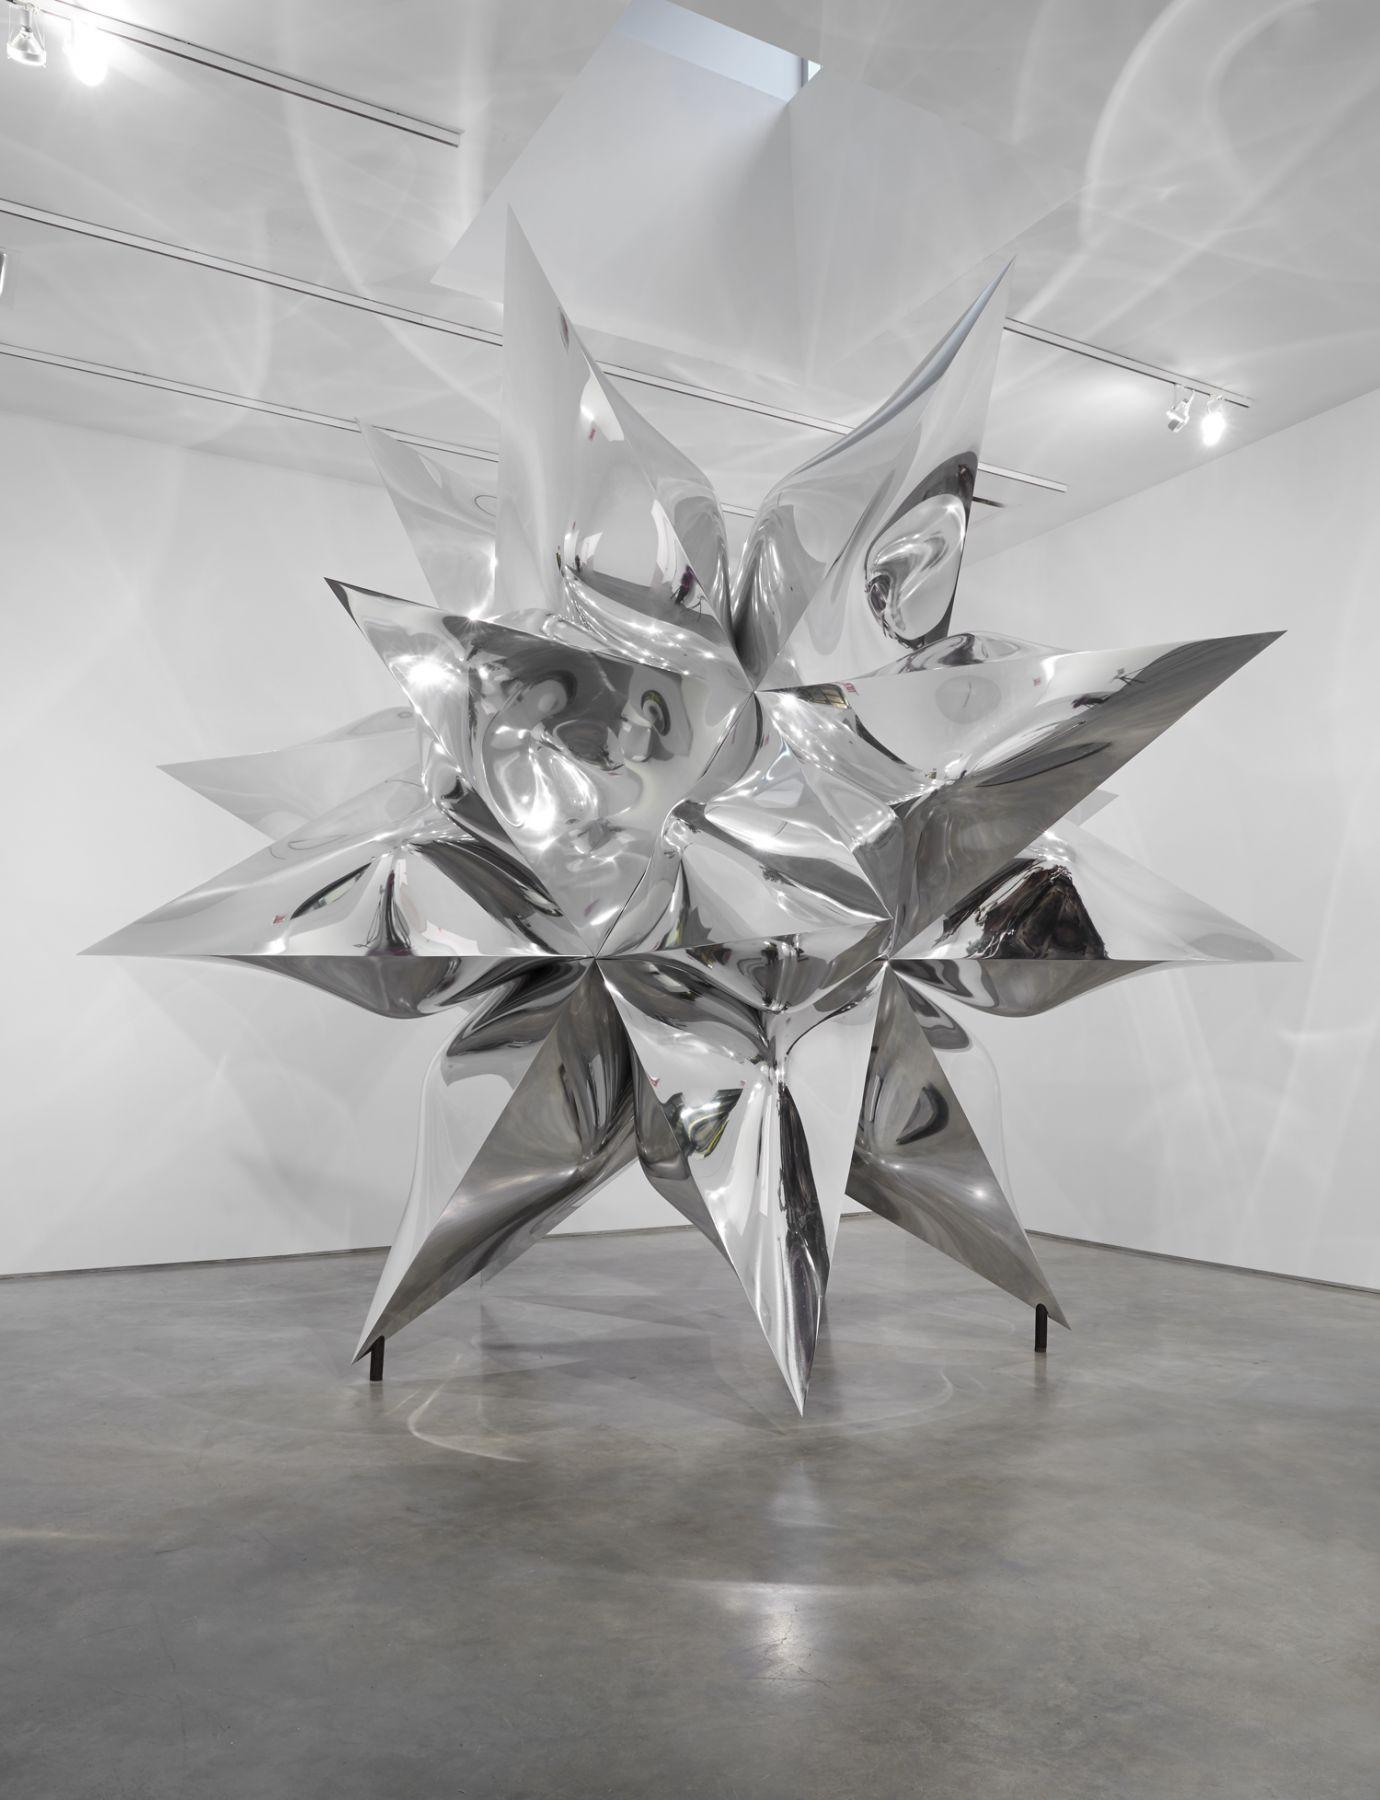 Installation view: Frank Stella Sculpture, November 7 - December 20, 2014